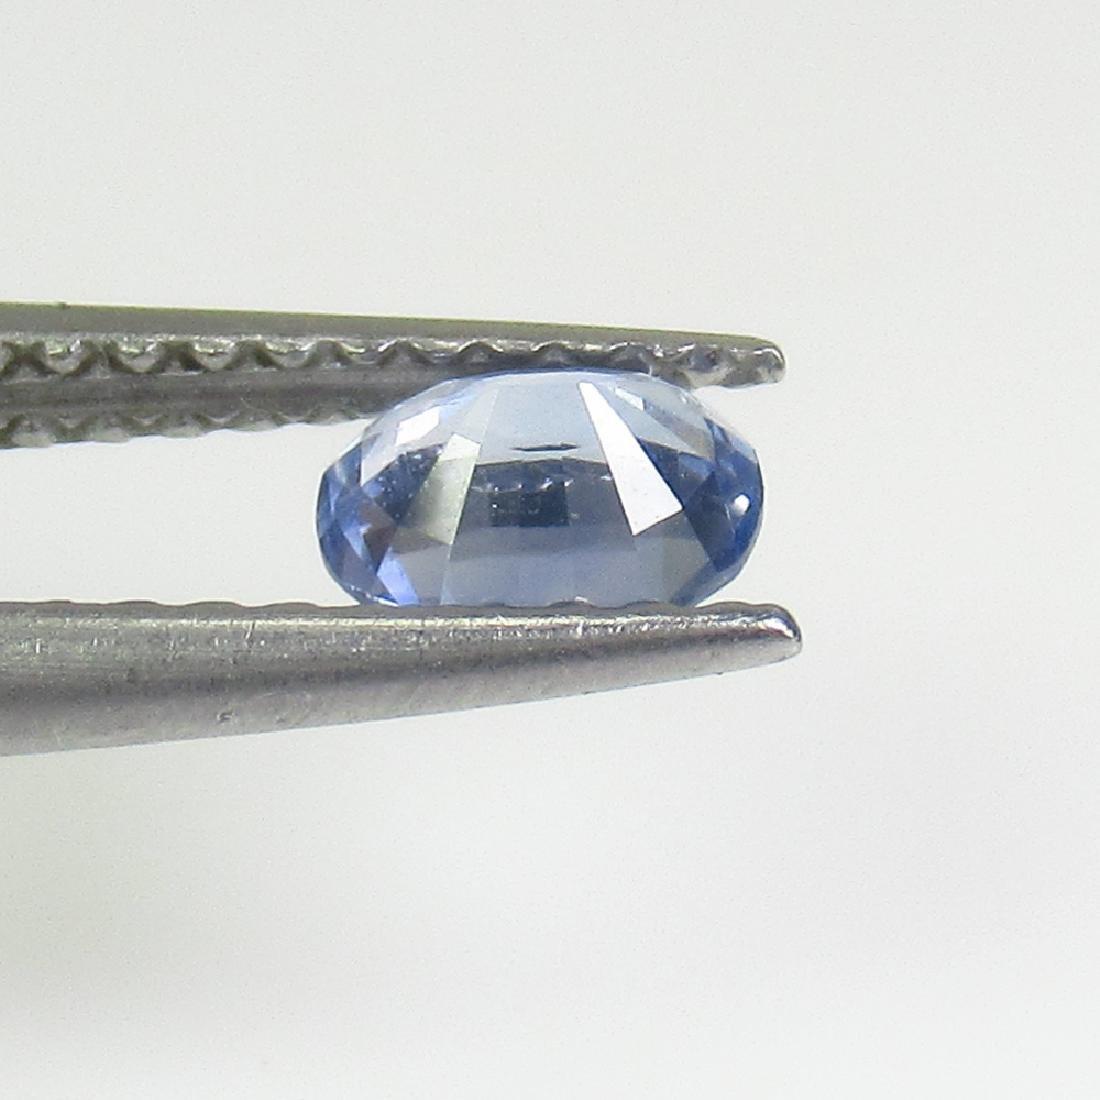 0.41 Ctw Natural Ceylon Blue Sapphire 5X4 mm Oval Cut - 2